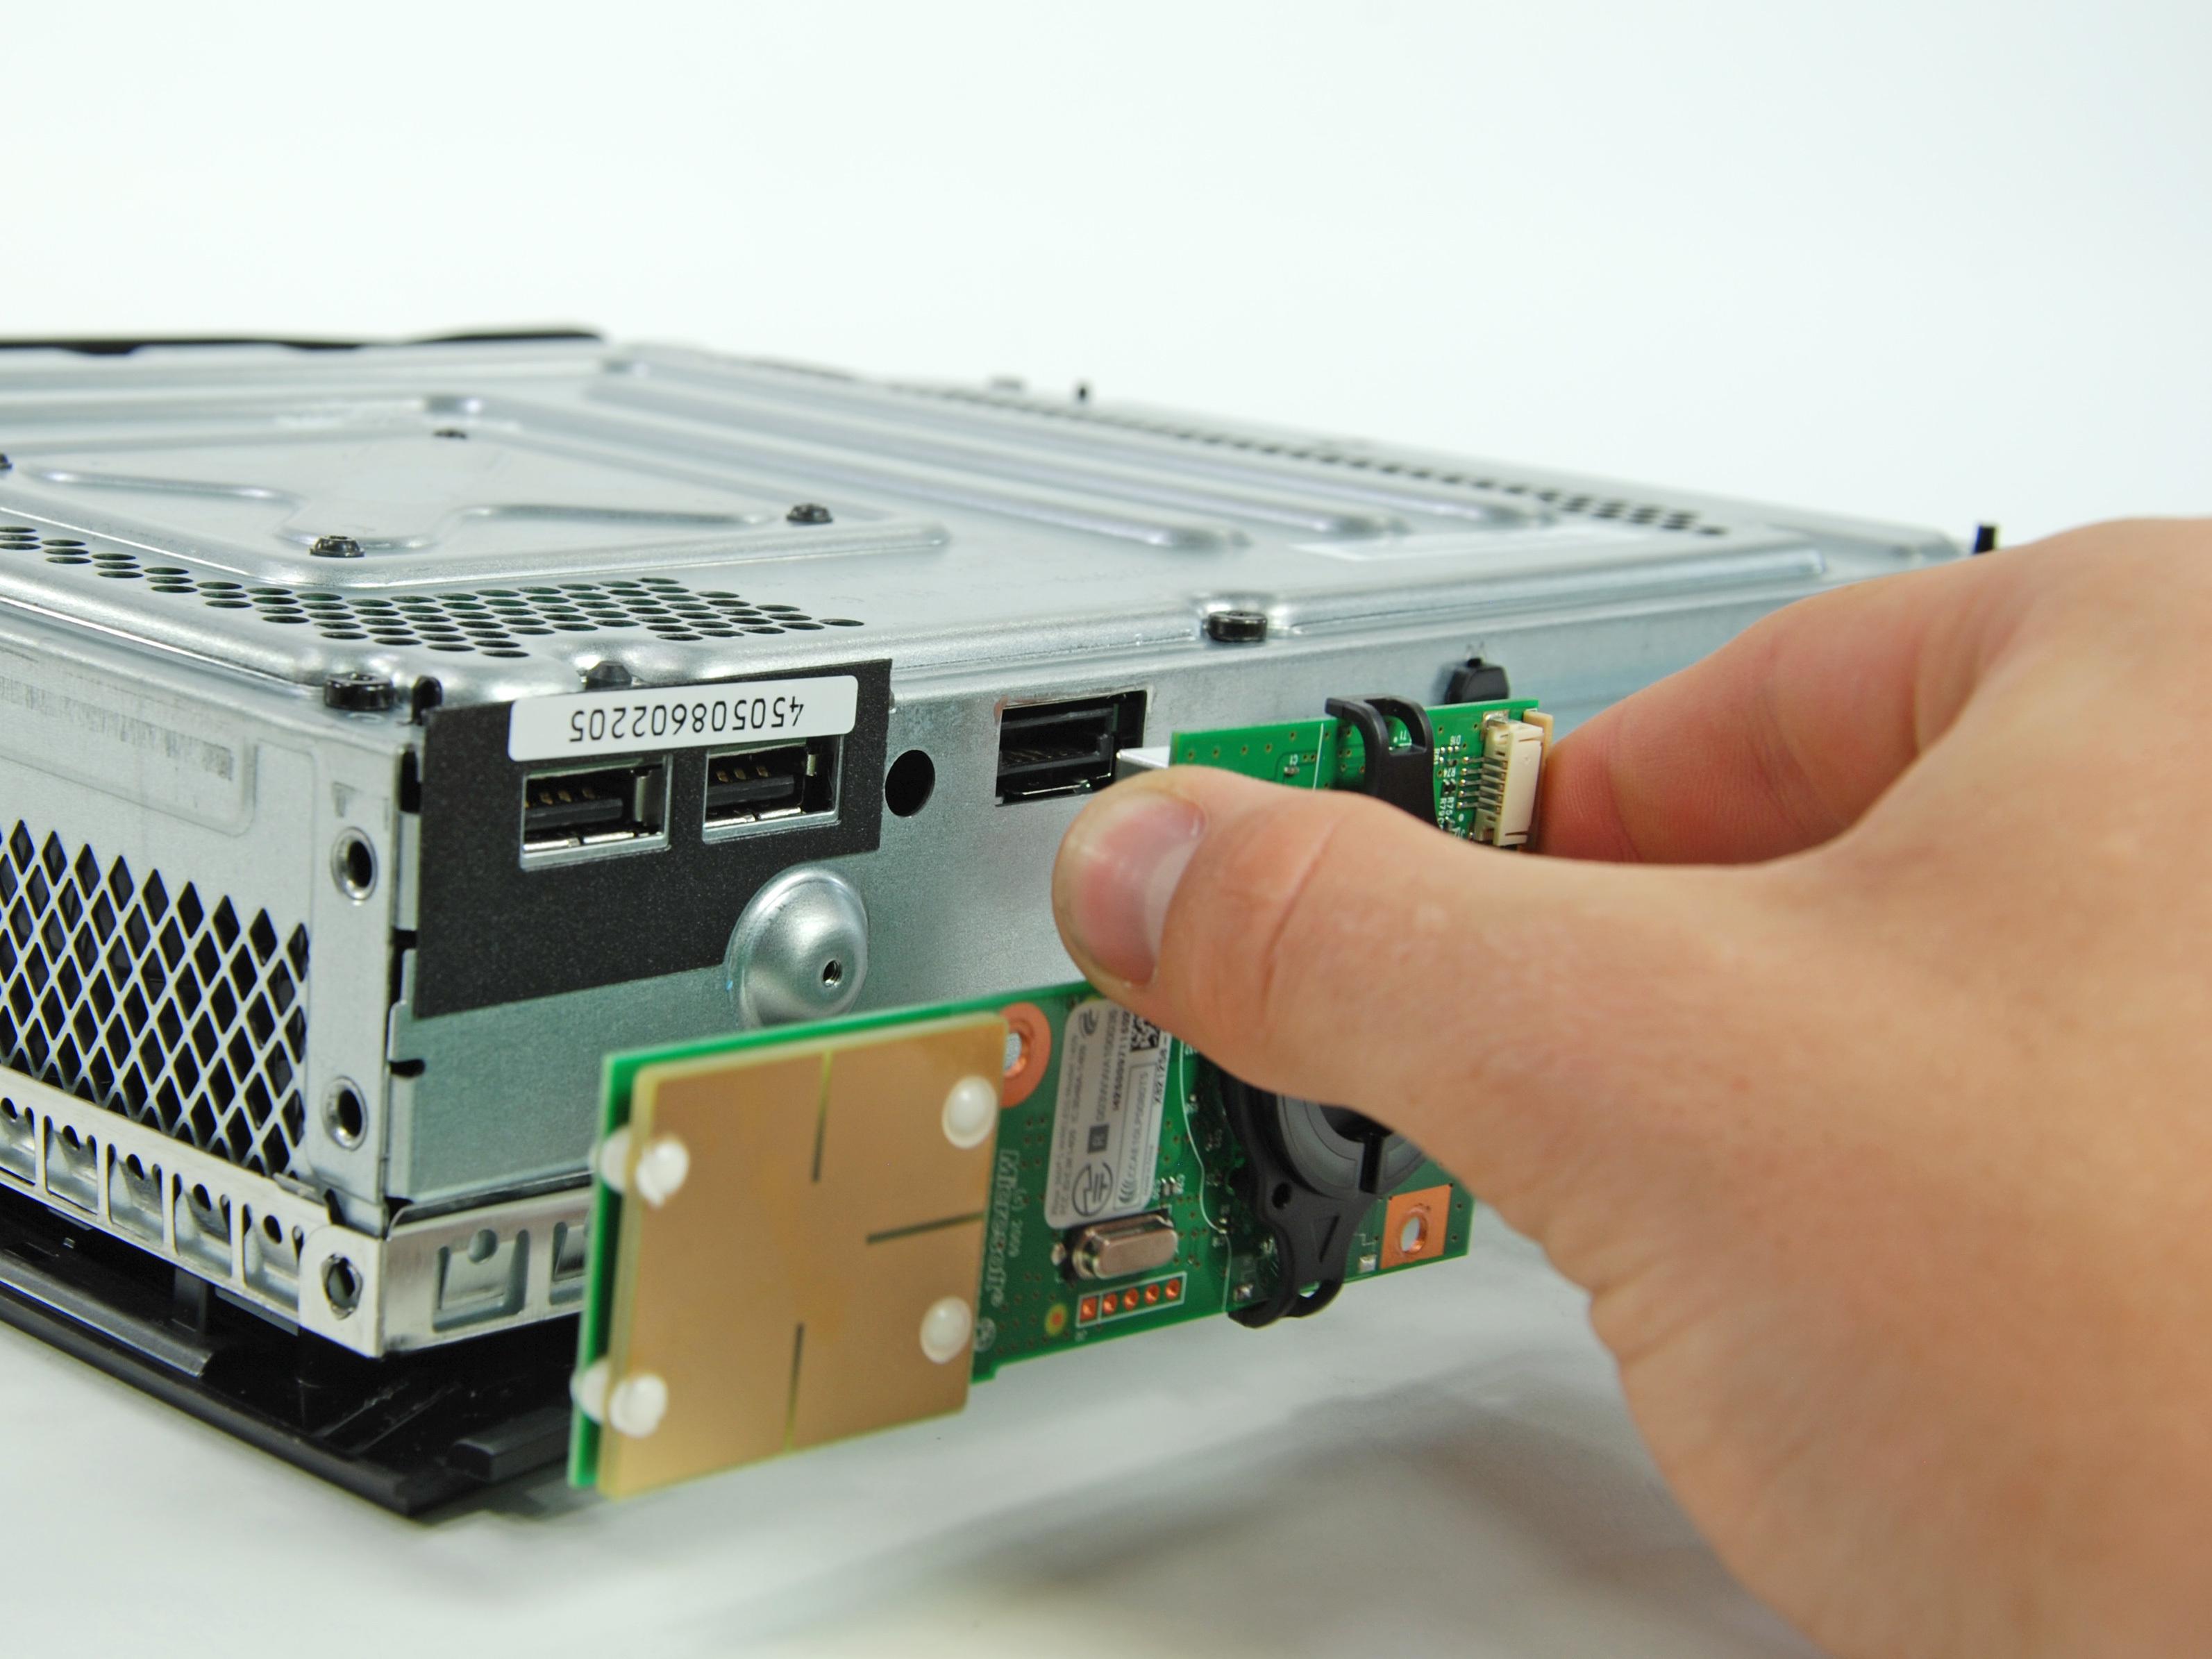 Xbox 360 S Repair Ifixit Controller Usb Wiring Diagram Rf Module